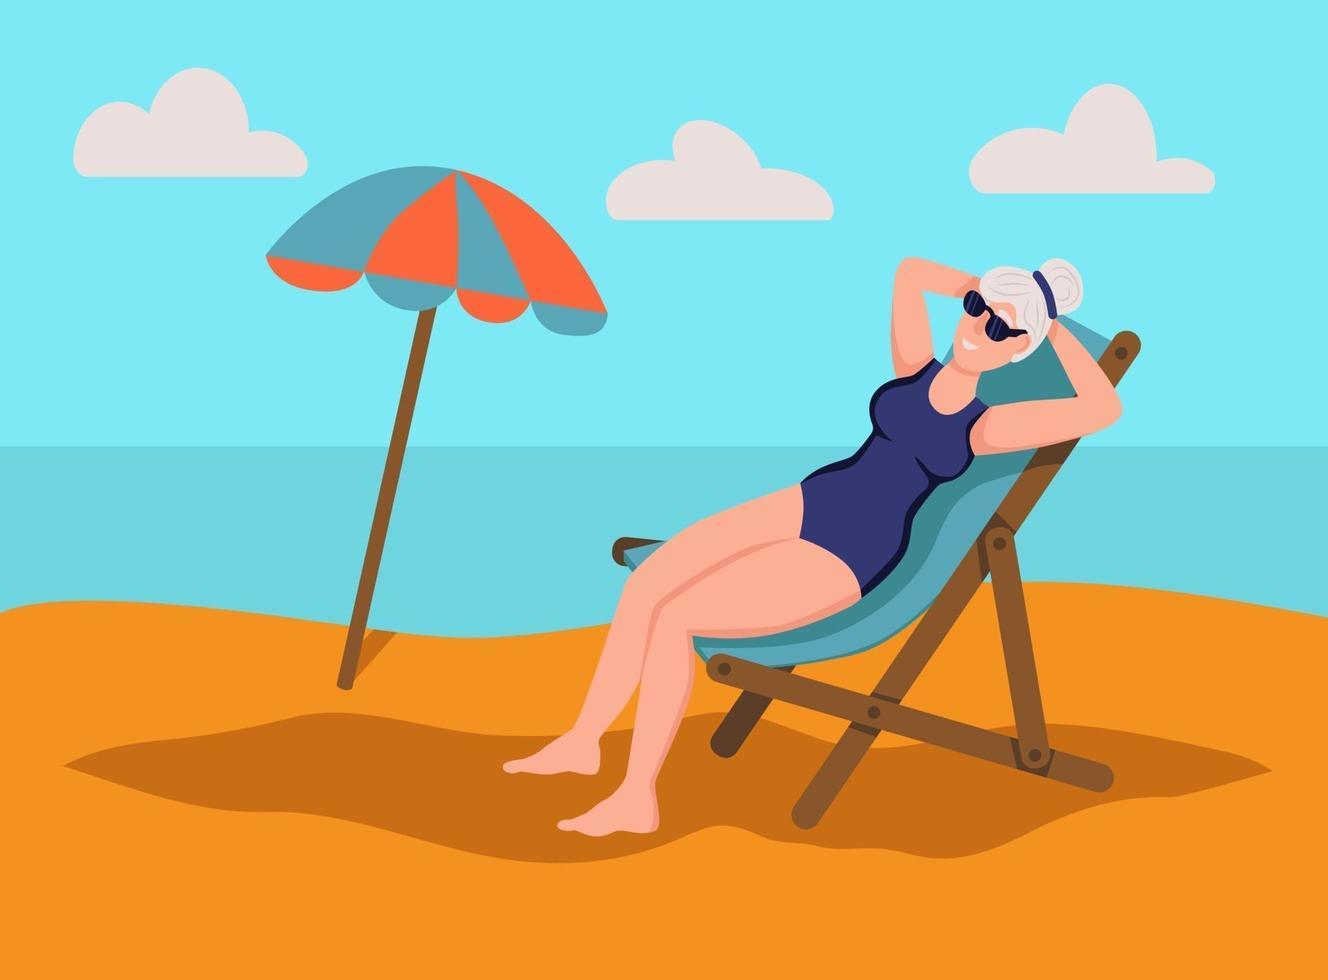 ältere Frau Sonnenbaden am Strand. Das Konzept des aktiven Alters. Tag der älteren Menschen. flache Karikaturvektorillustration. vektor